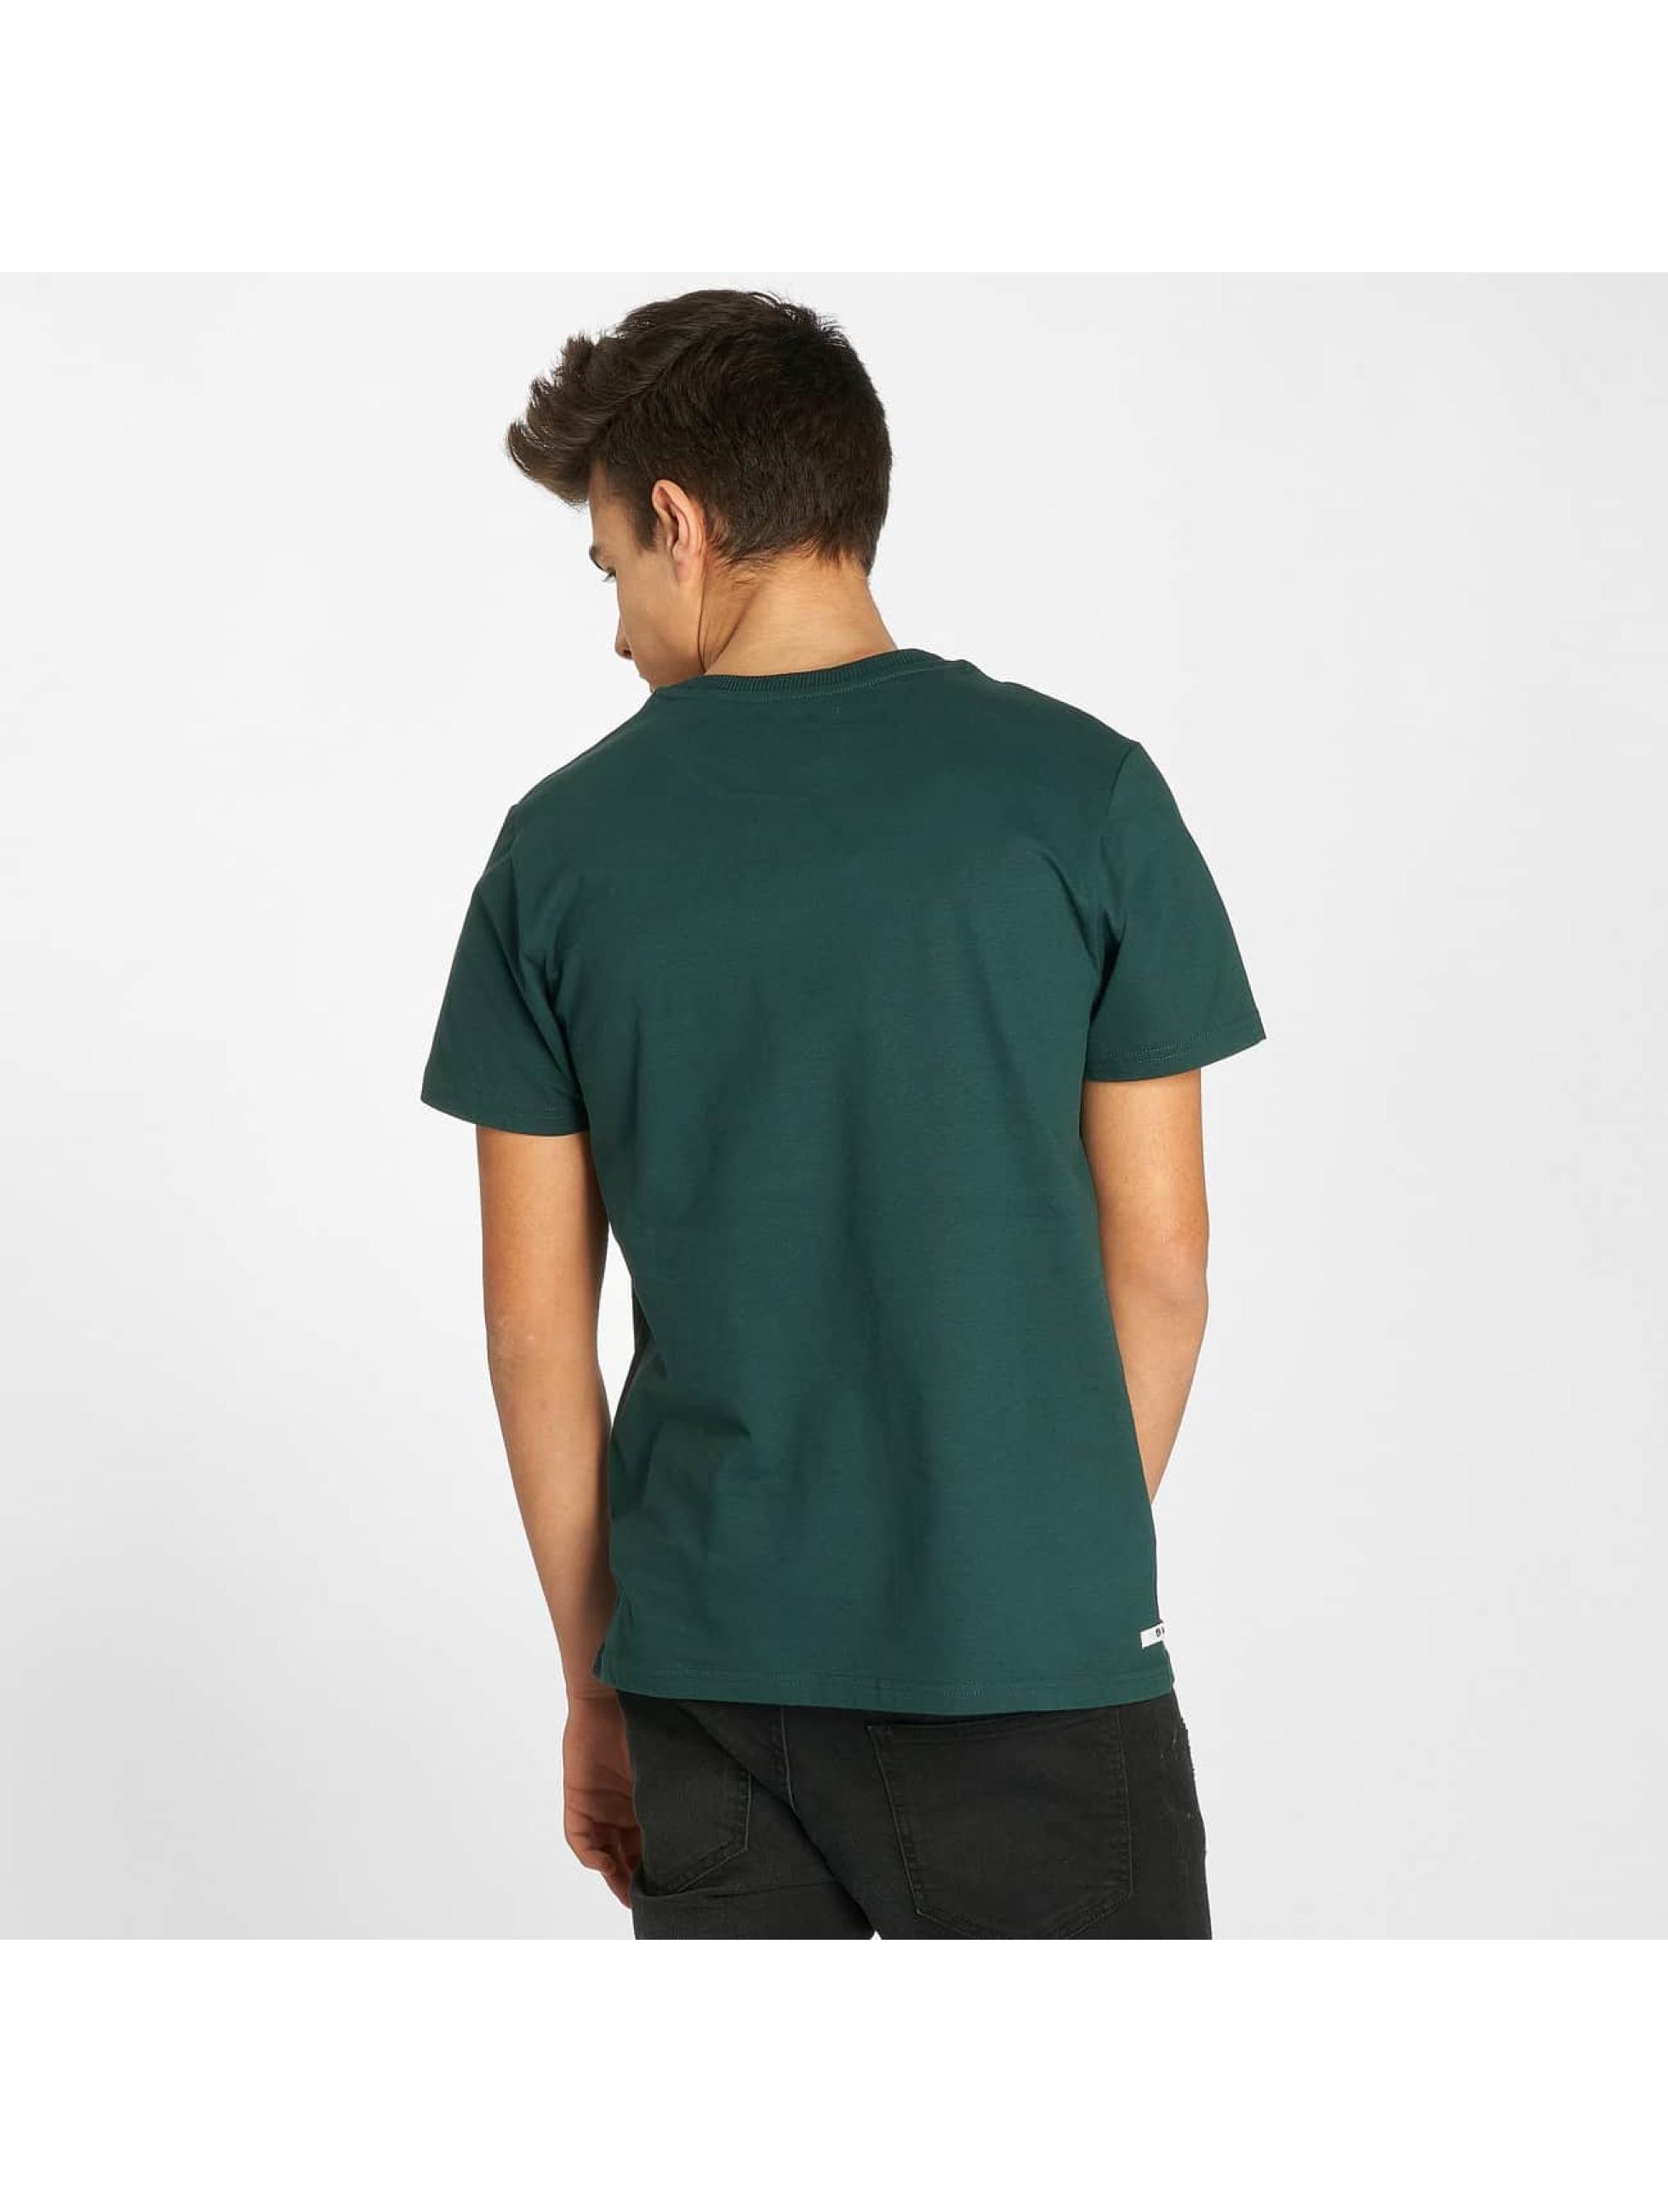 Kulte T-Shirt Corpo grün